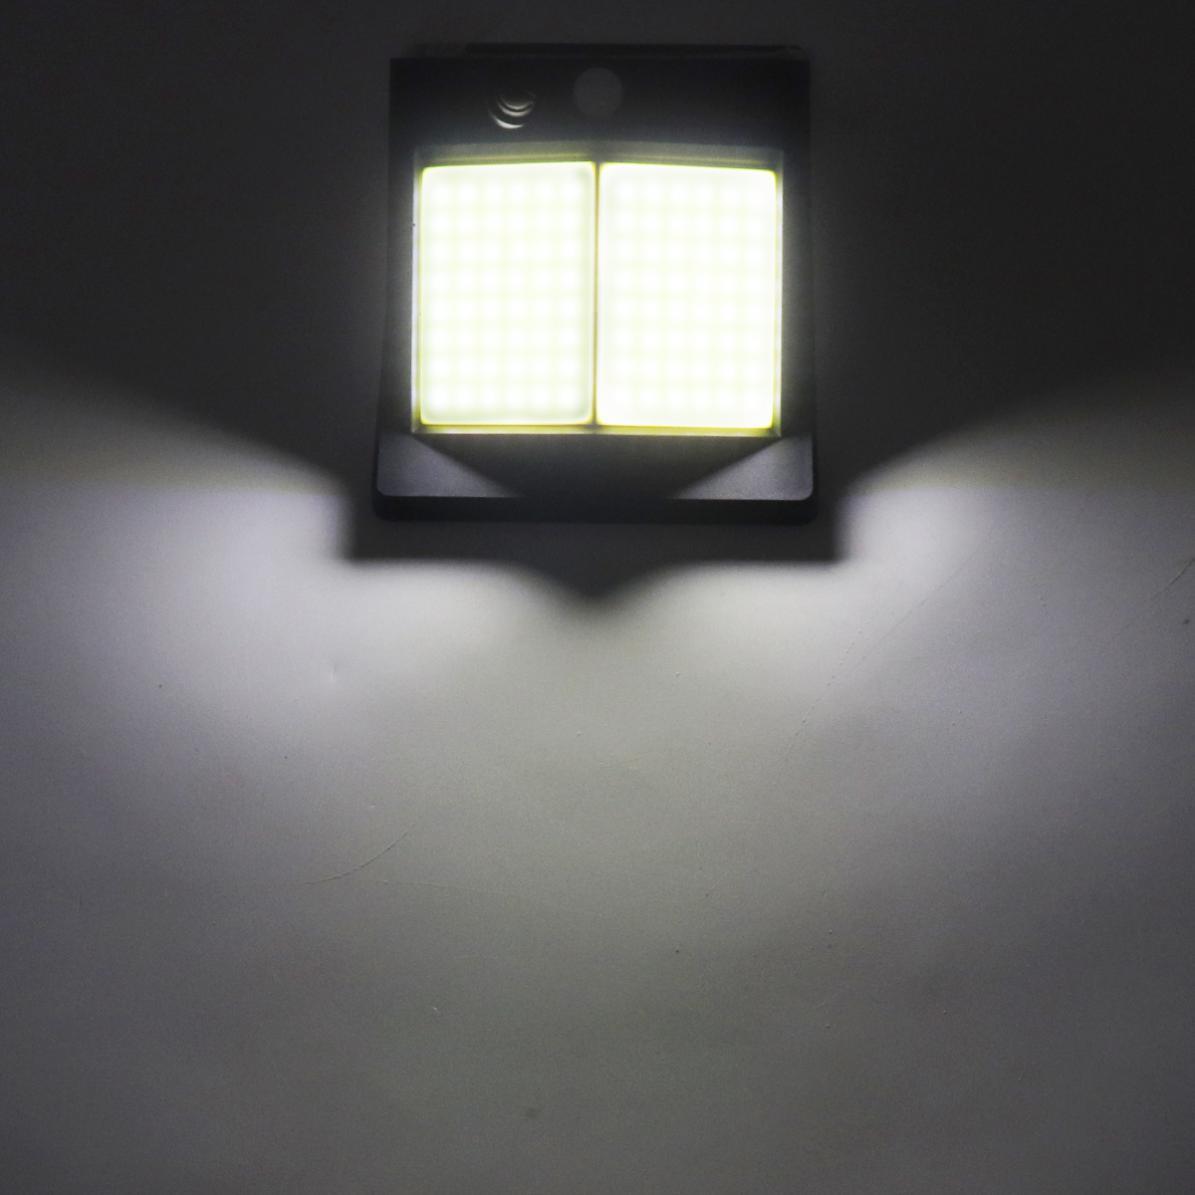 96 cob 400lm luz controlado corpo humano